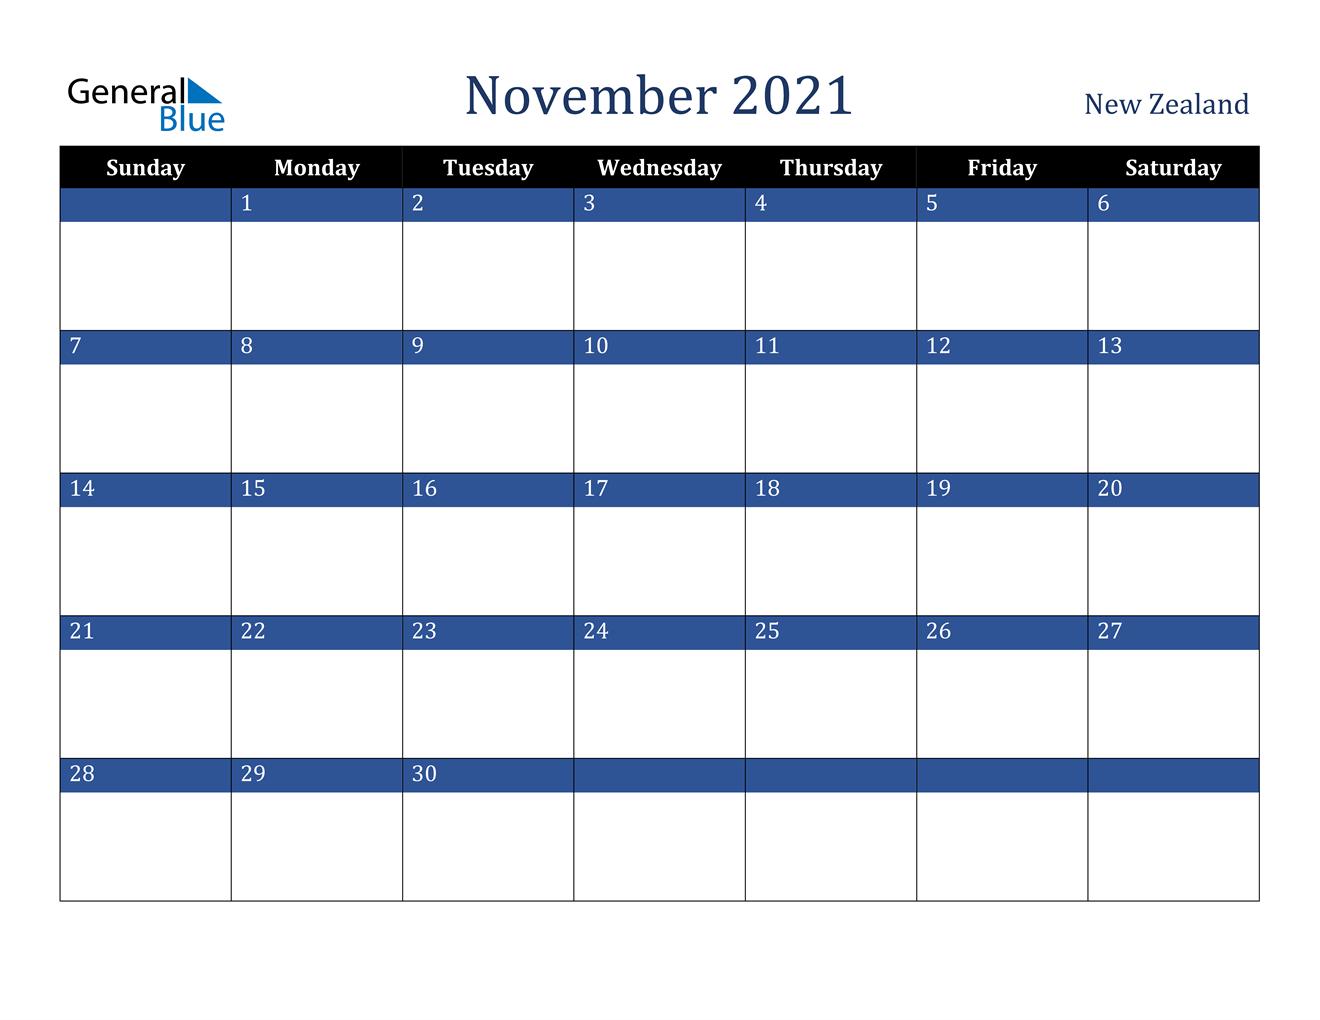 November 2021 Calendar - New Zealand